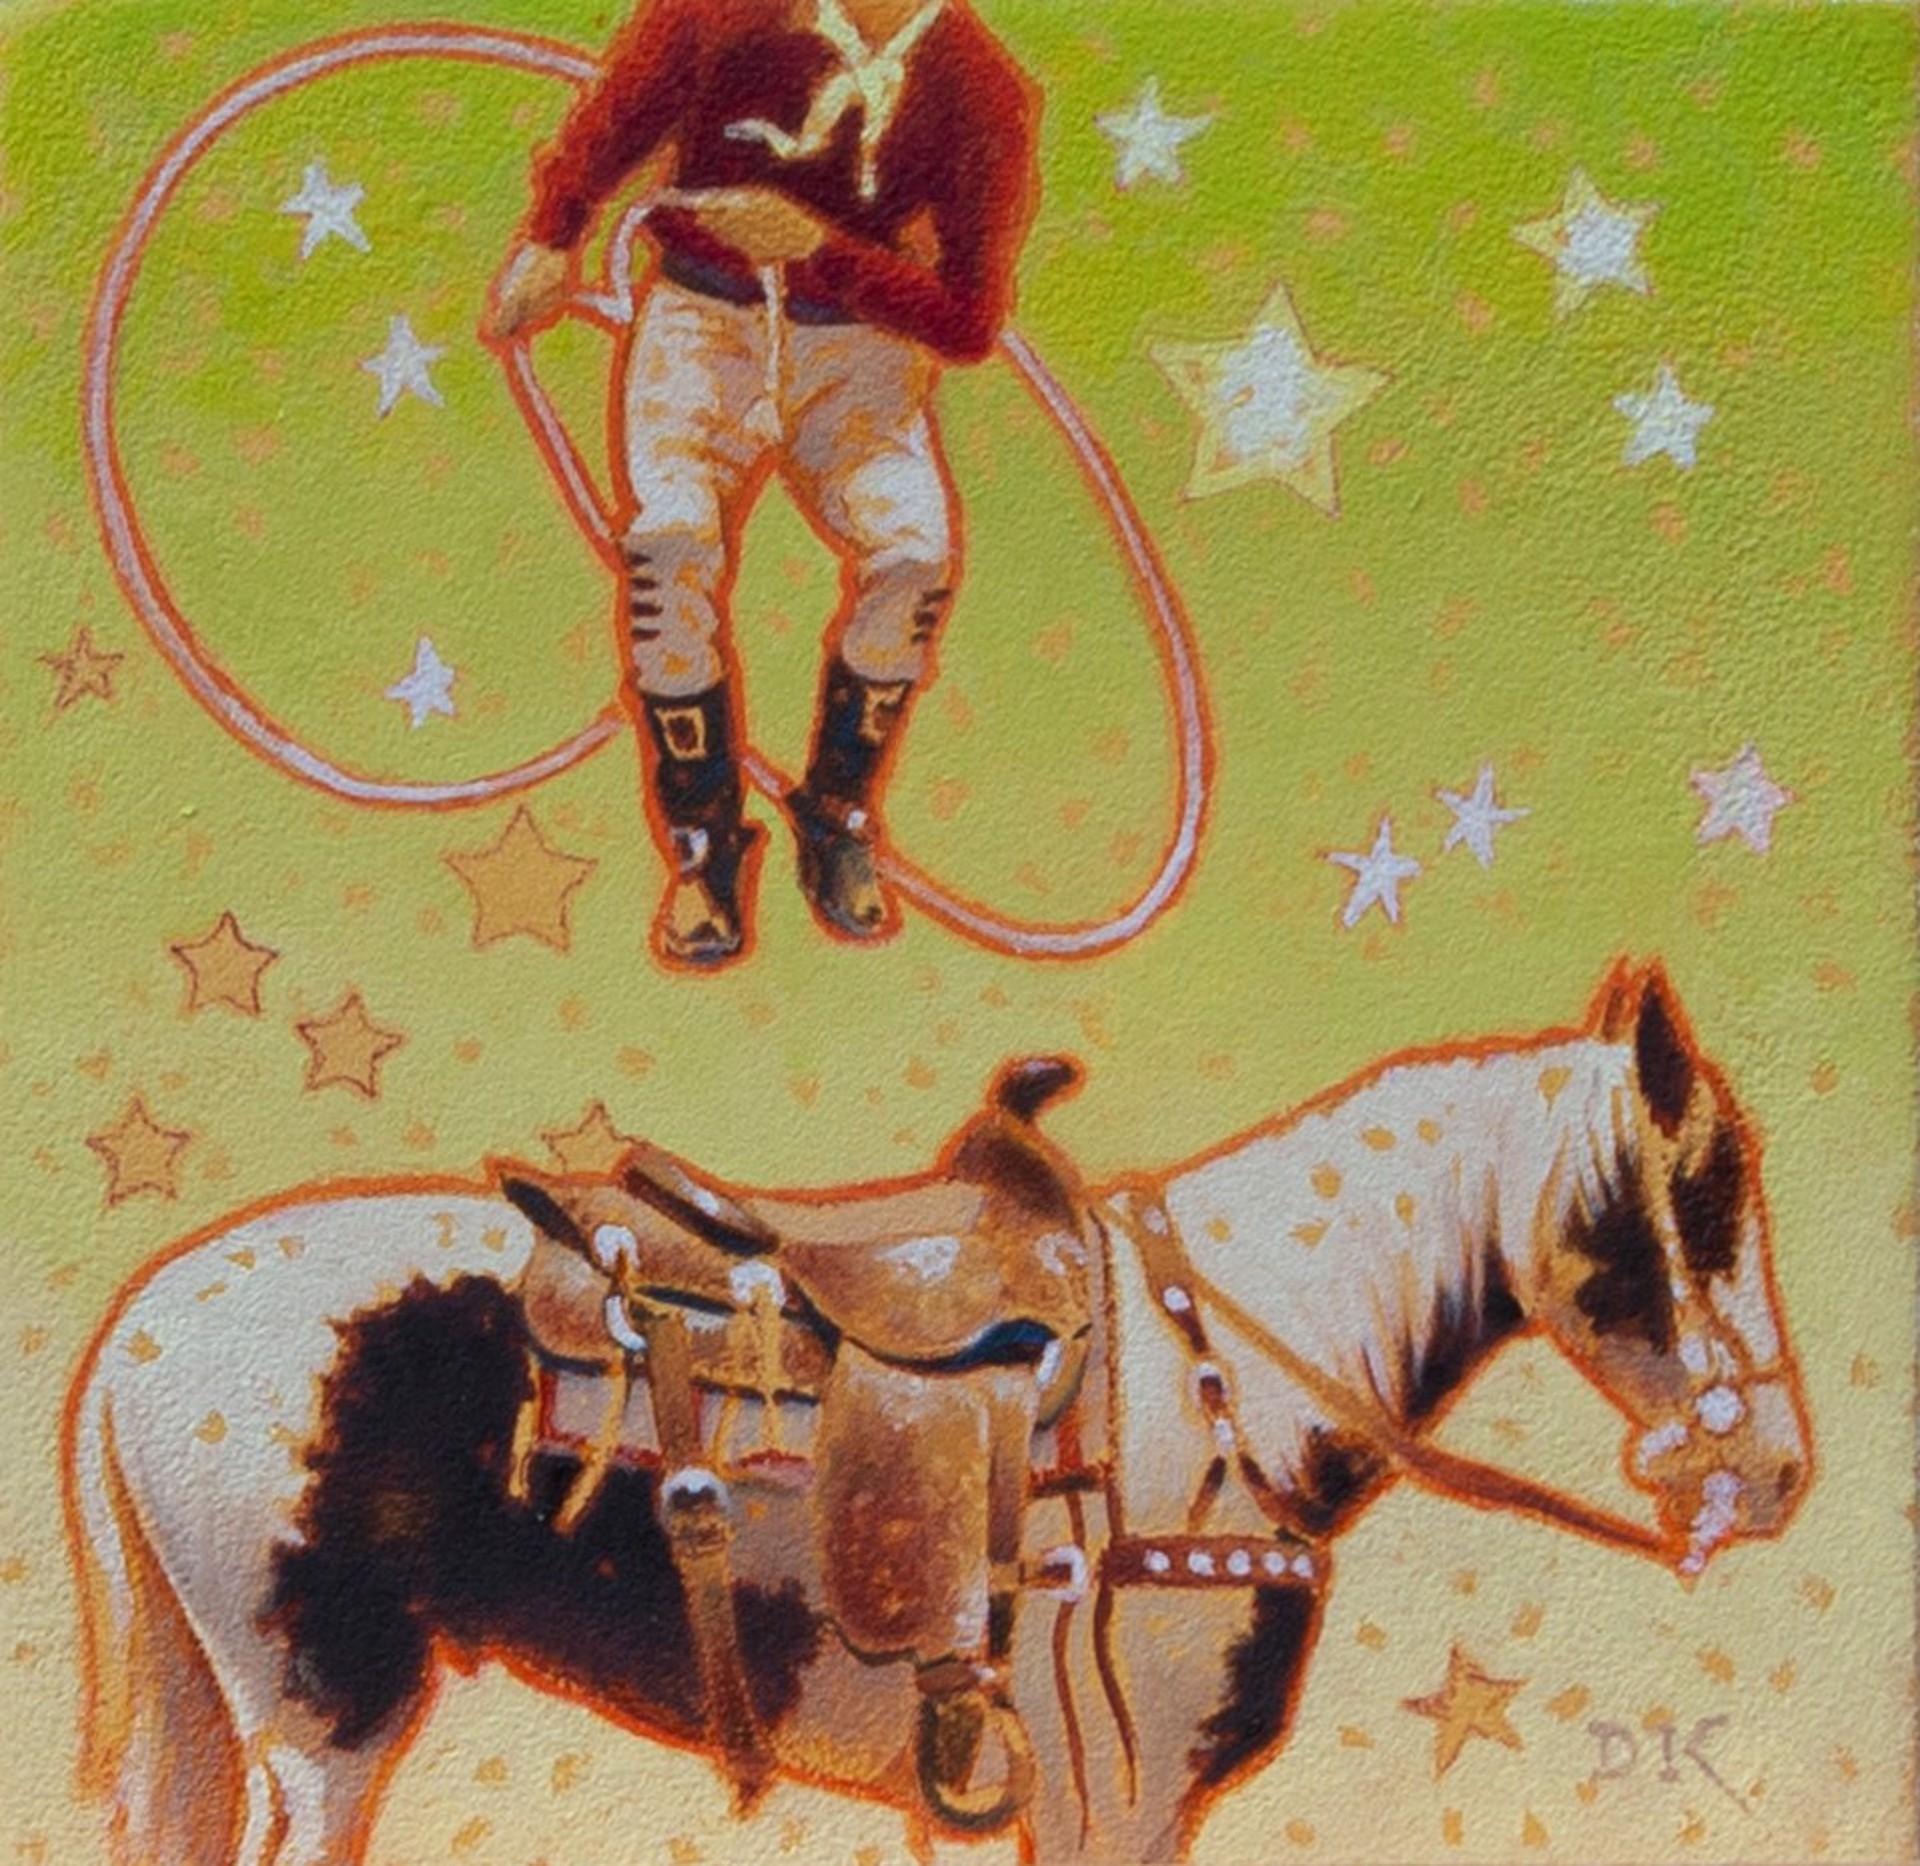 The Stars at Night by David Kammerzell